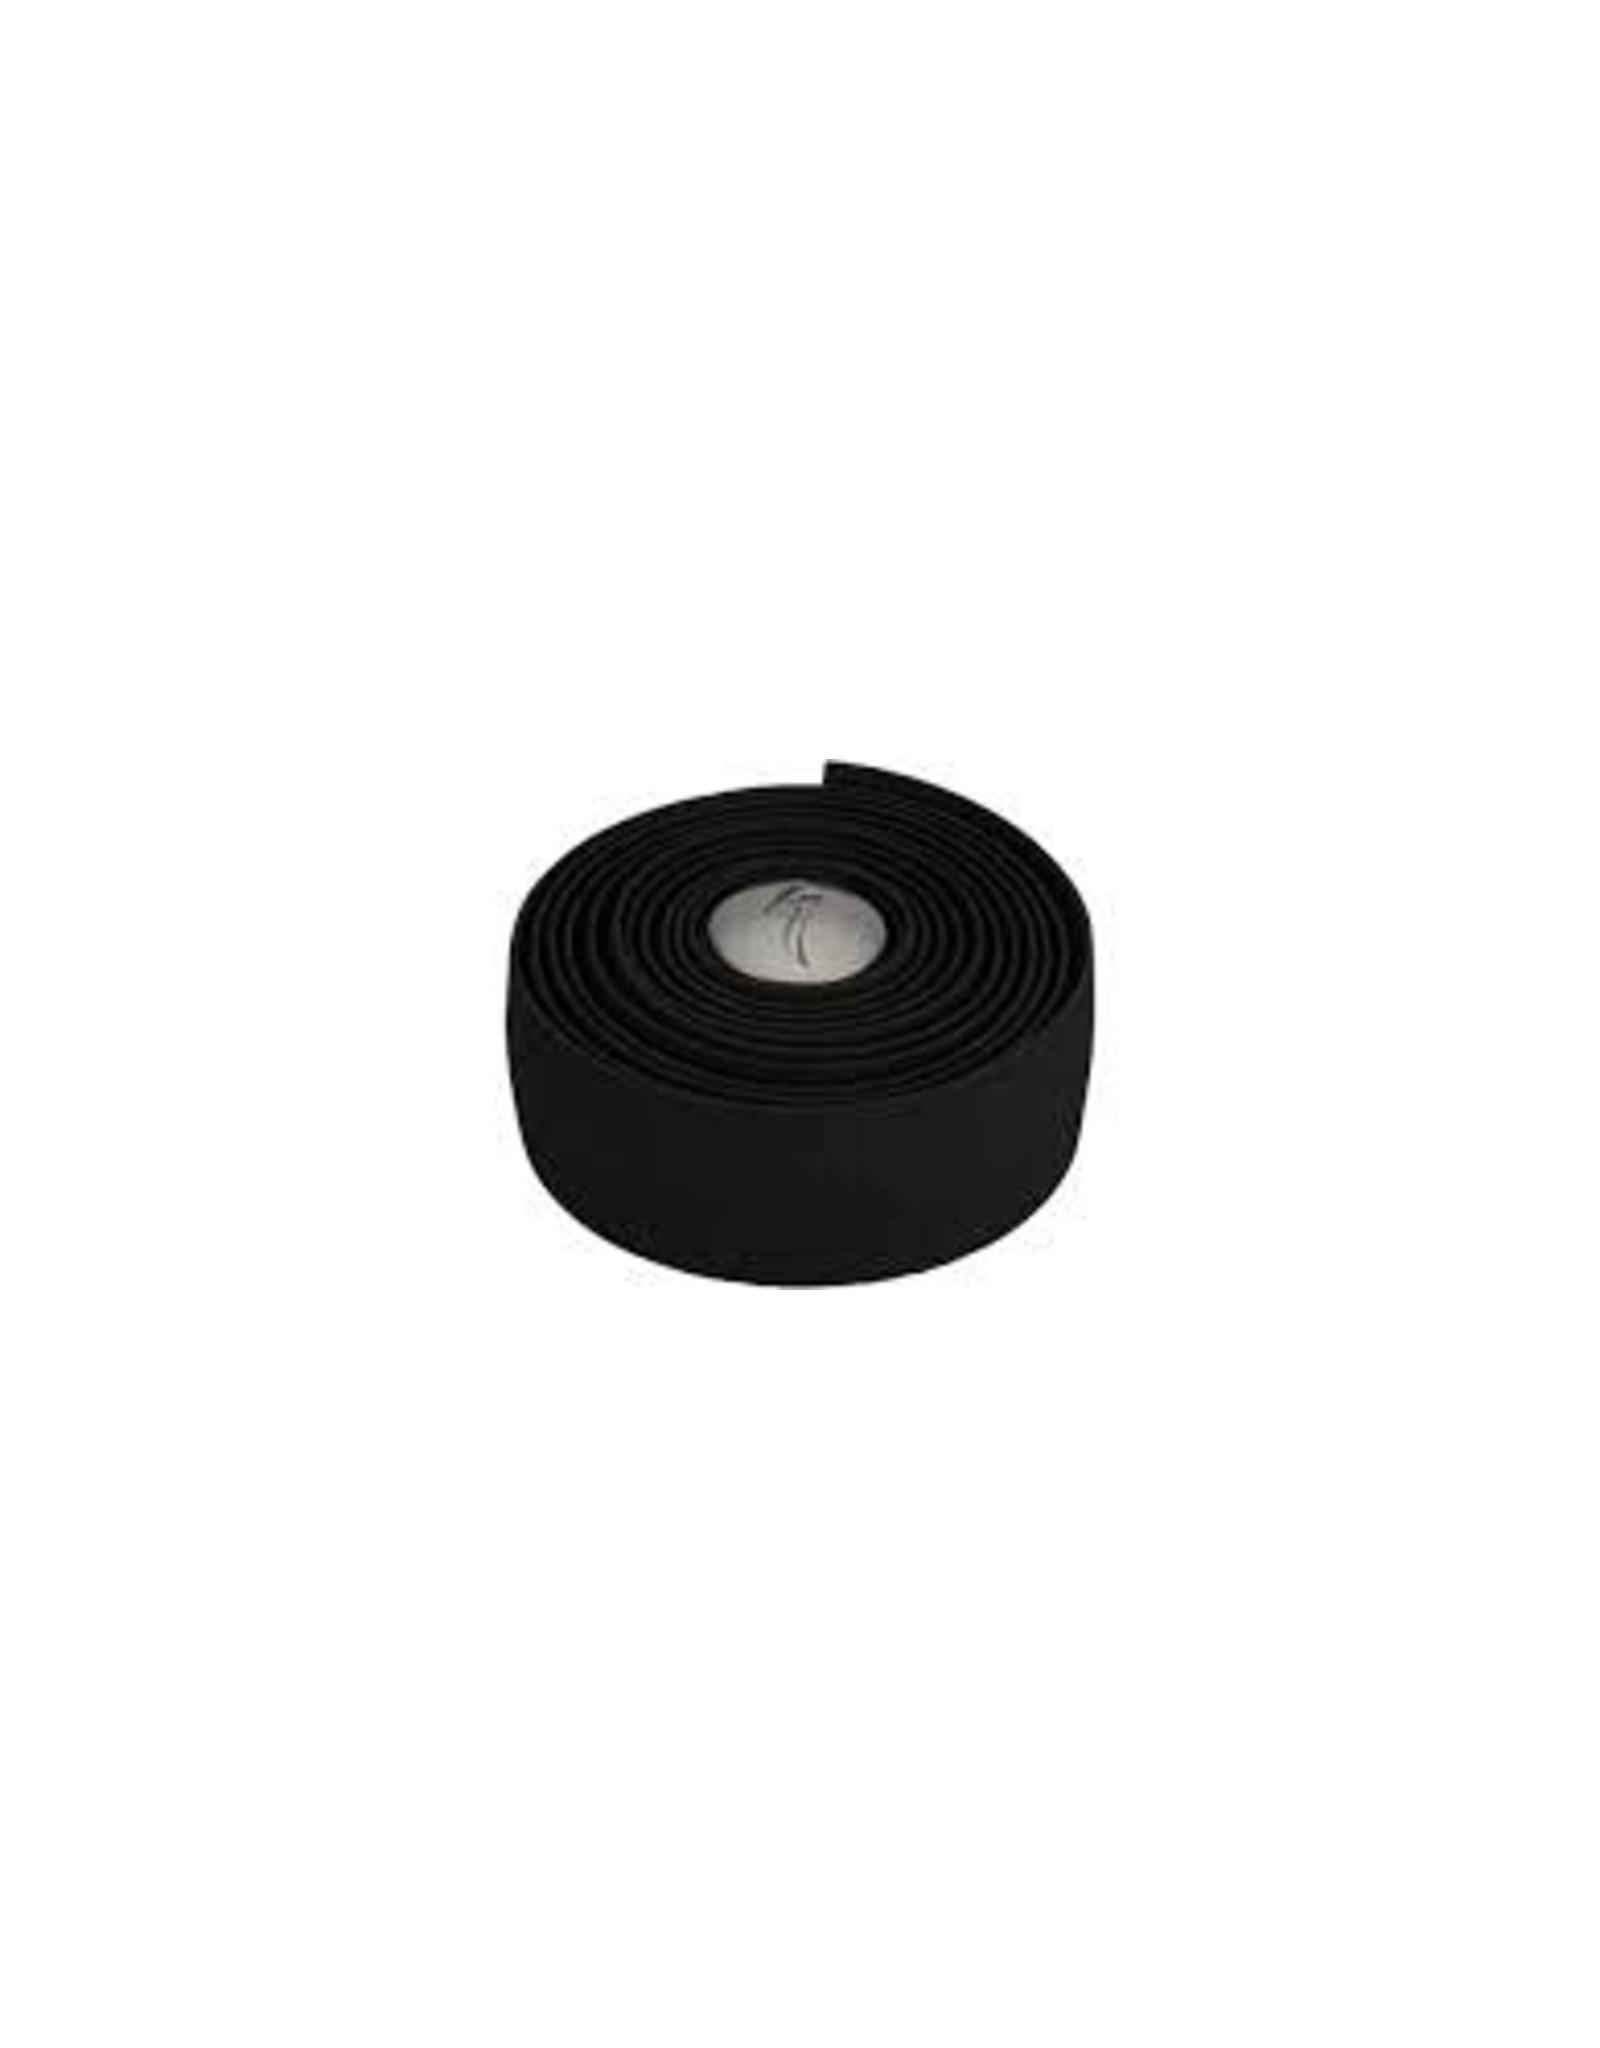 Specialized Bar Tape Spec S Wrap Roubaix Blk 30 mm